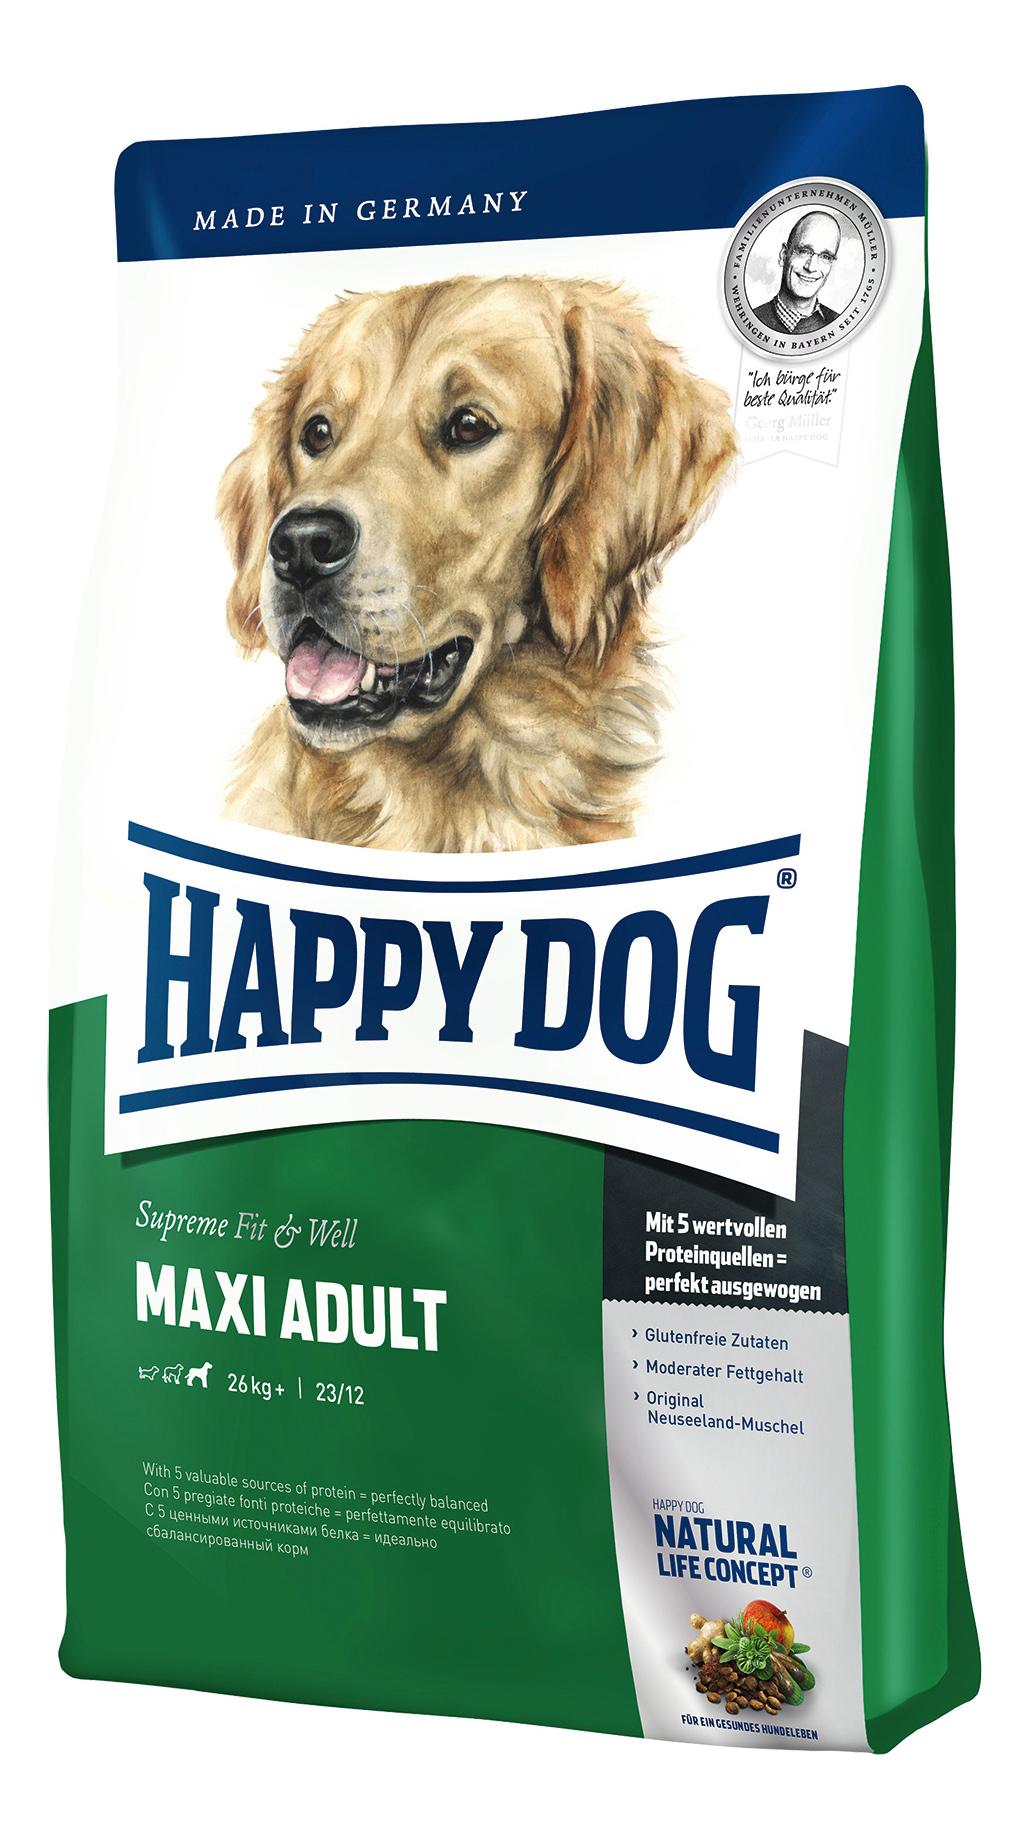 Сухой корм для собак Happy Dog Supreme Fit & Well Maxi, крупные породы,домашняя птица,15кг